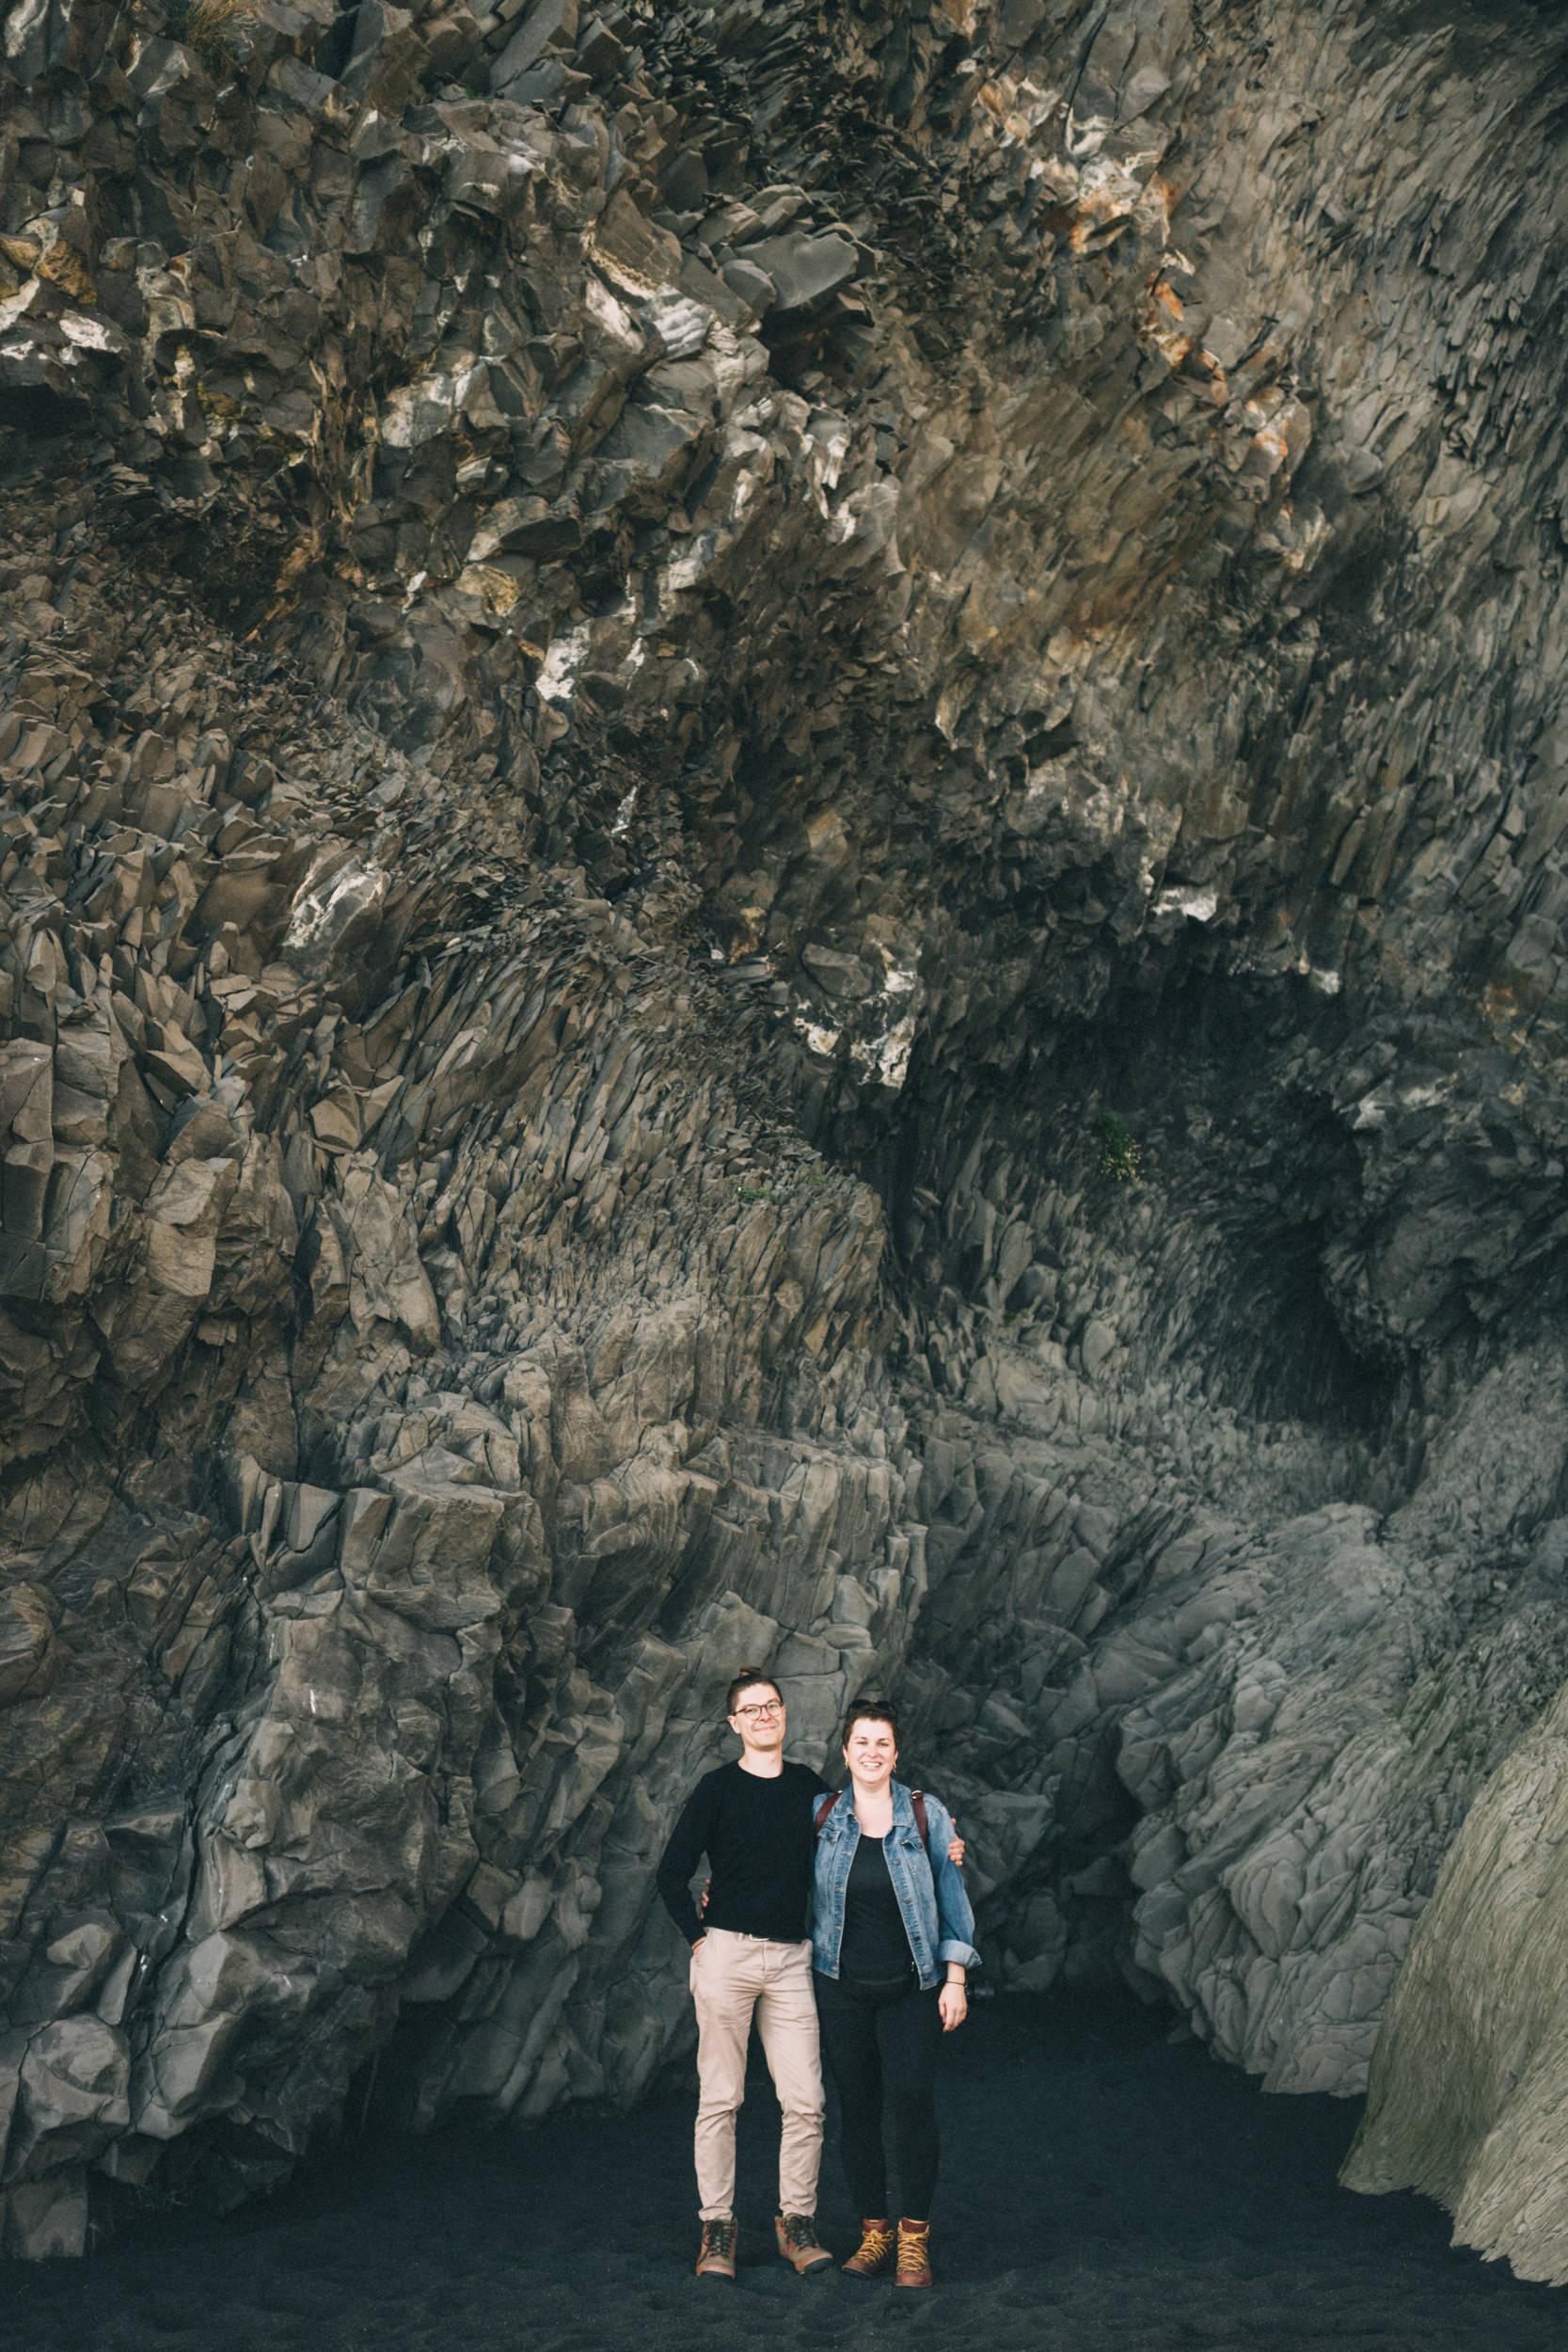 Sarah-Katherine-Davis-Photography-Iceland-Adventure-Elopement-Photographer-Louisville-Kentucky-Wedding-Photographer-Travel-Vik-Beach-Engagement-Session-Red-Dress-Reynisfjara-142edit.jpg